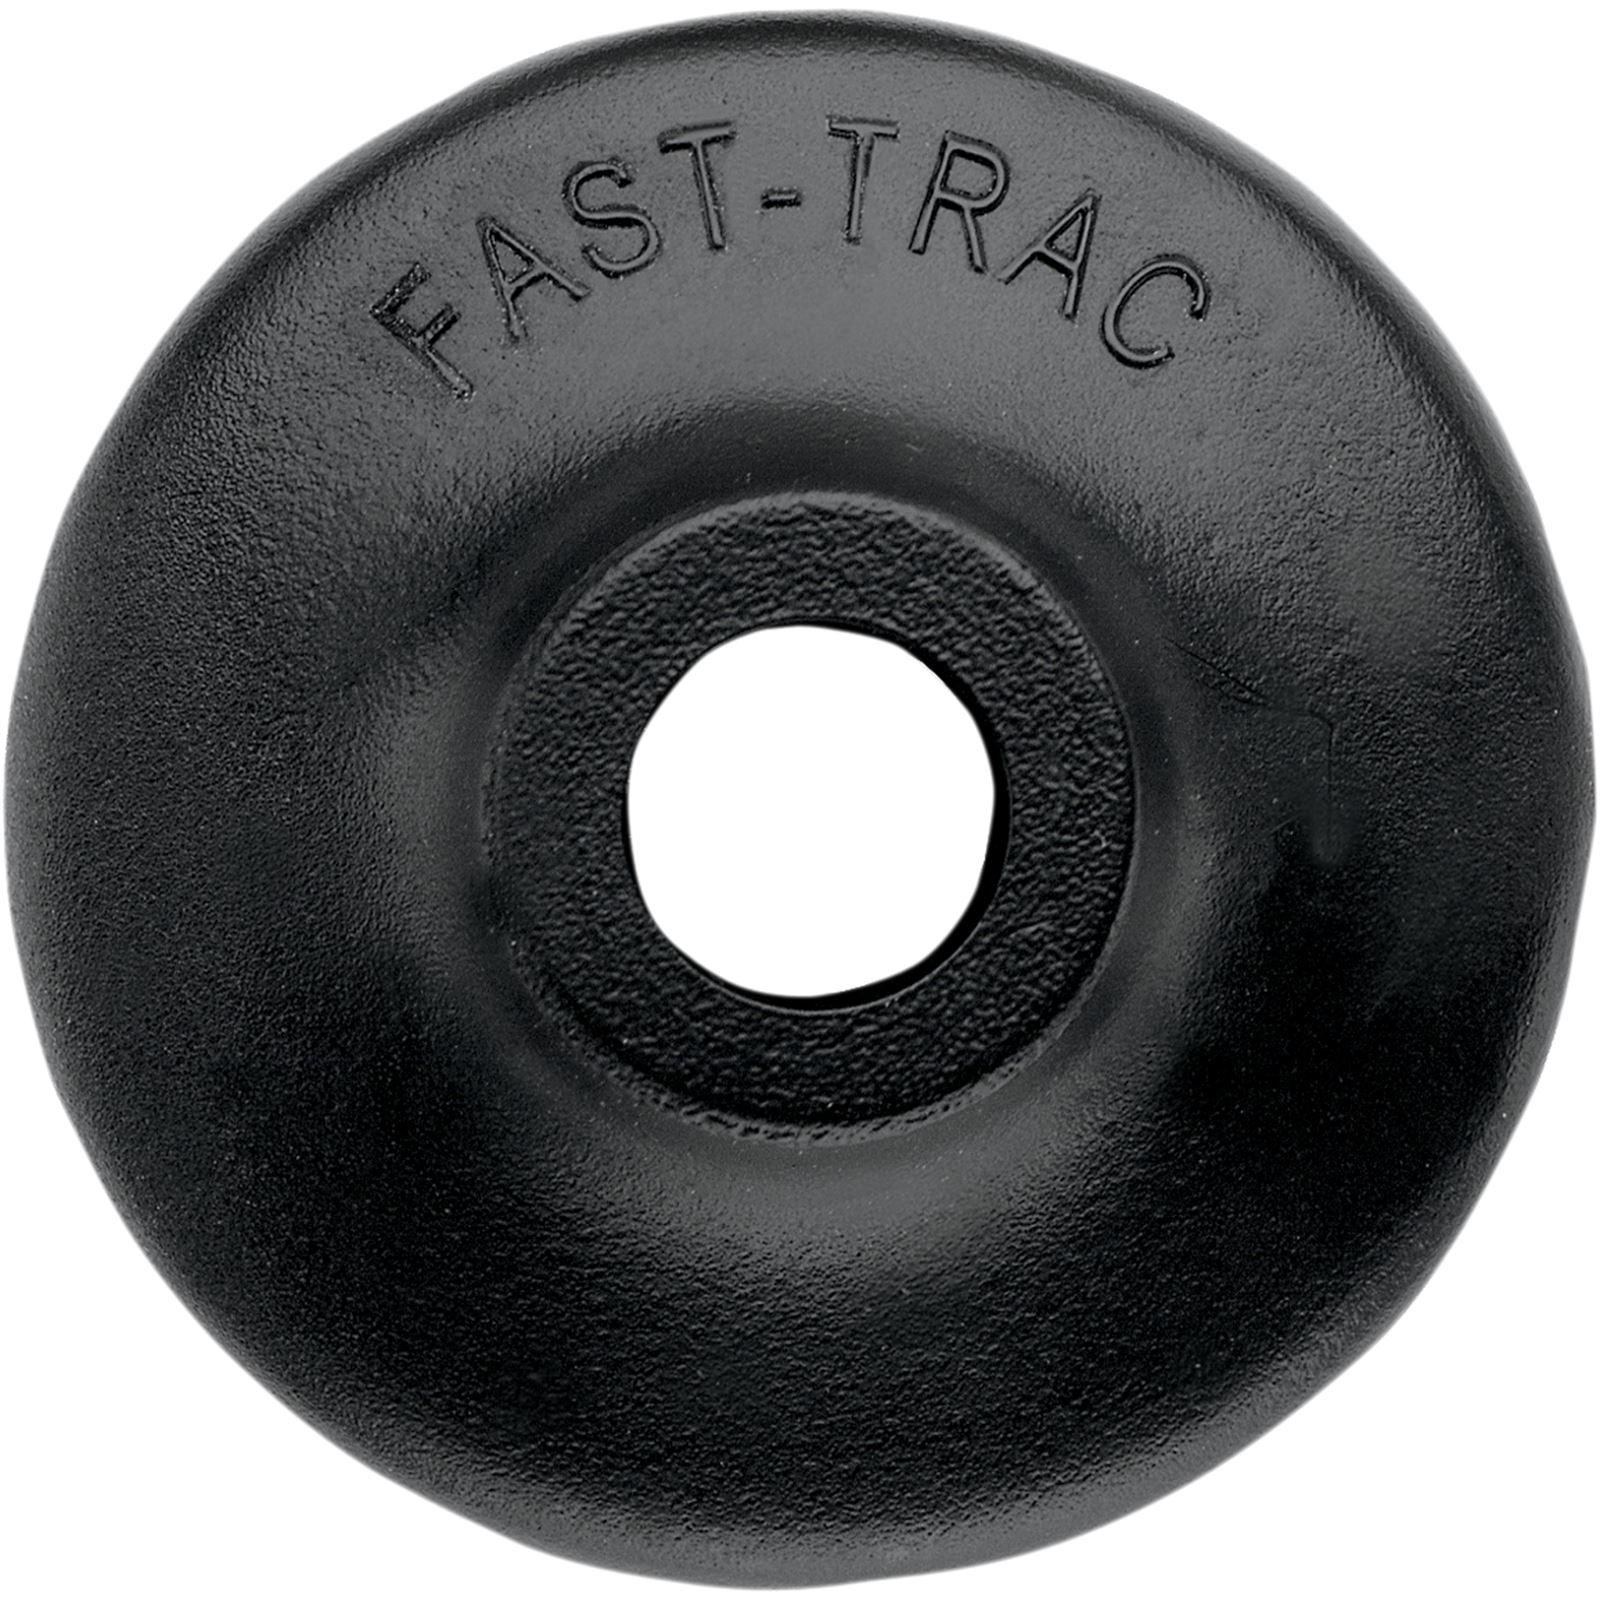 Fast-Trac Backer Plates - Black - Single - 24/Pack